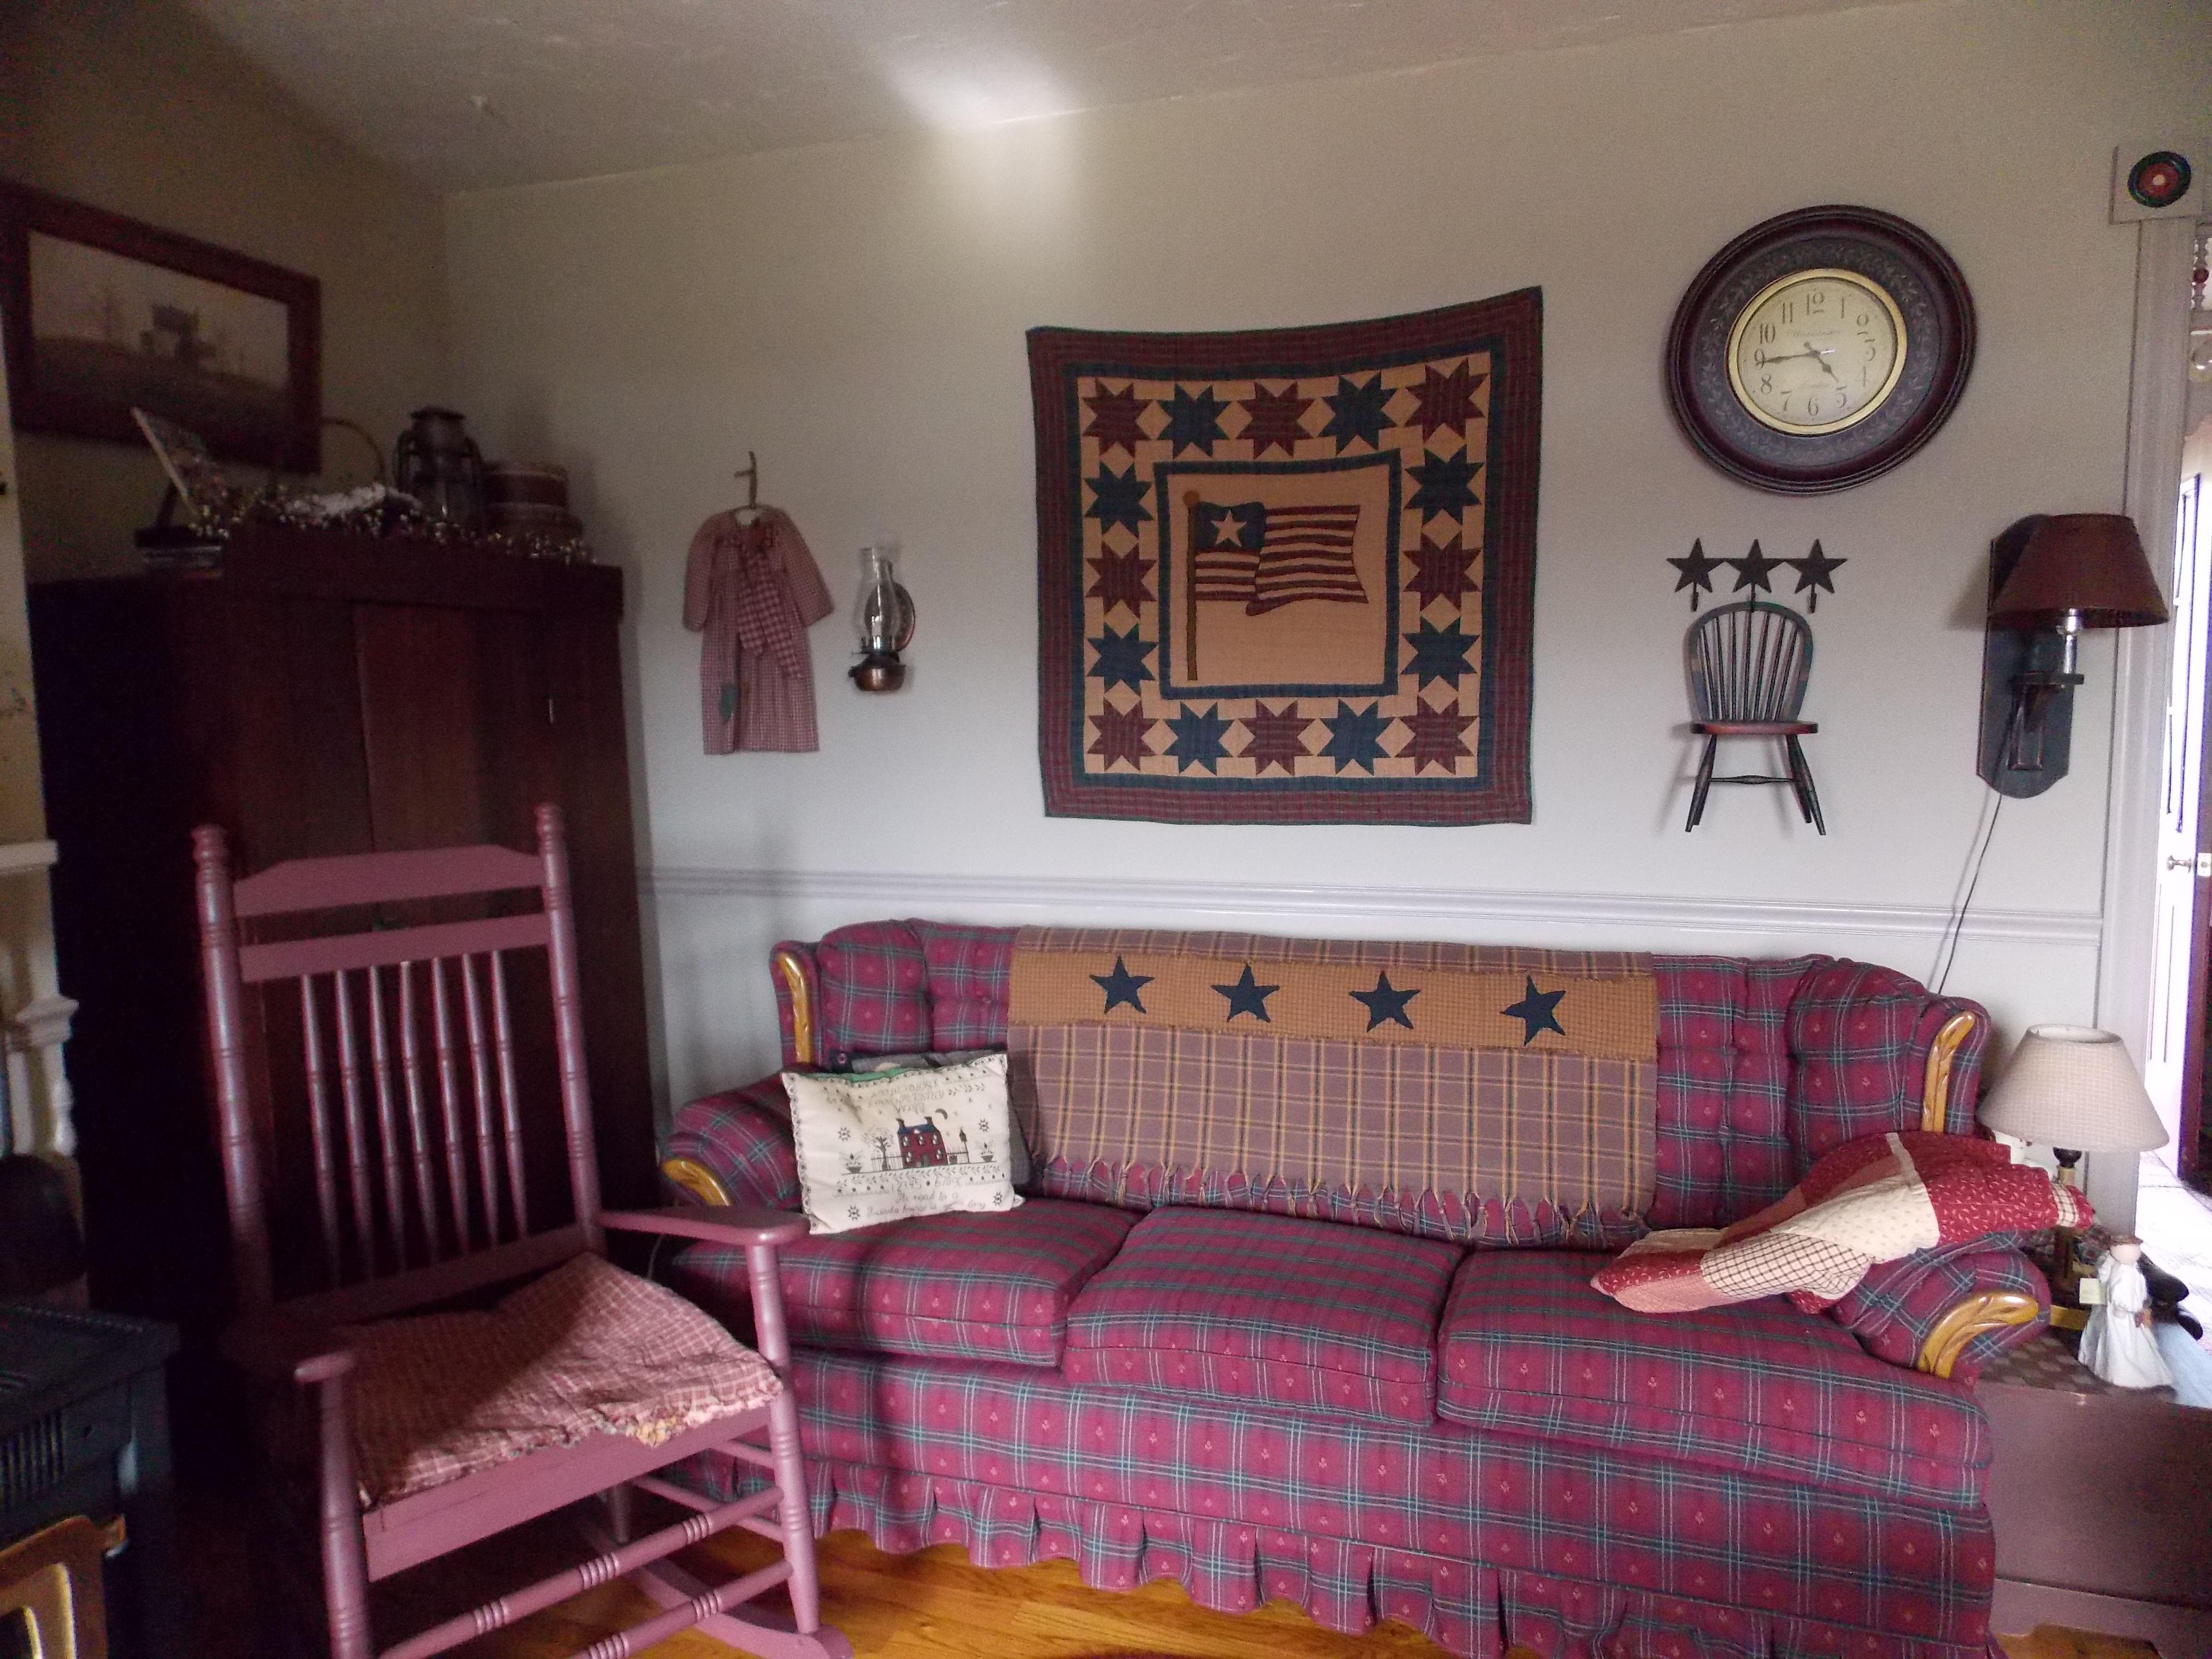 Americana Living Room Decorating Ideas - Zion Star